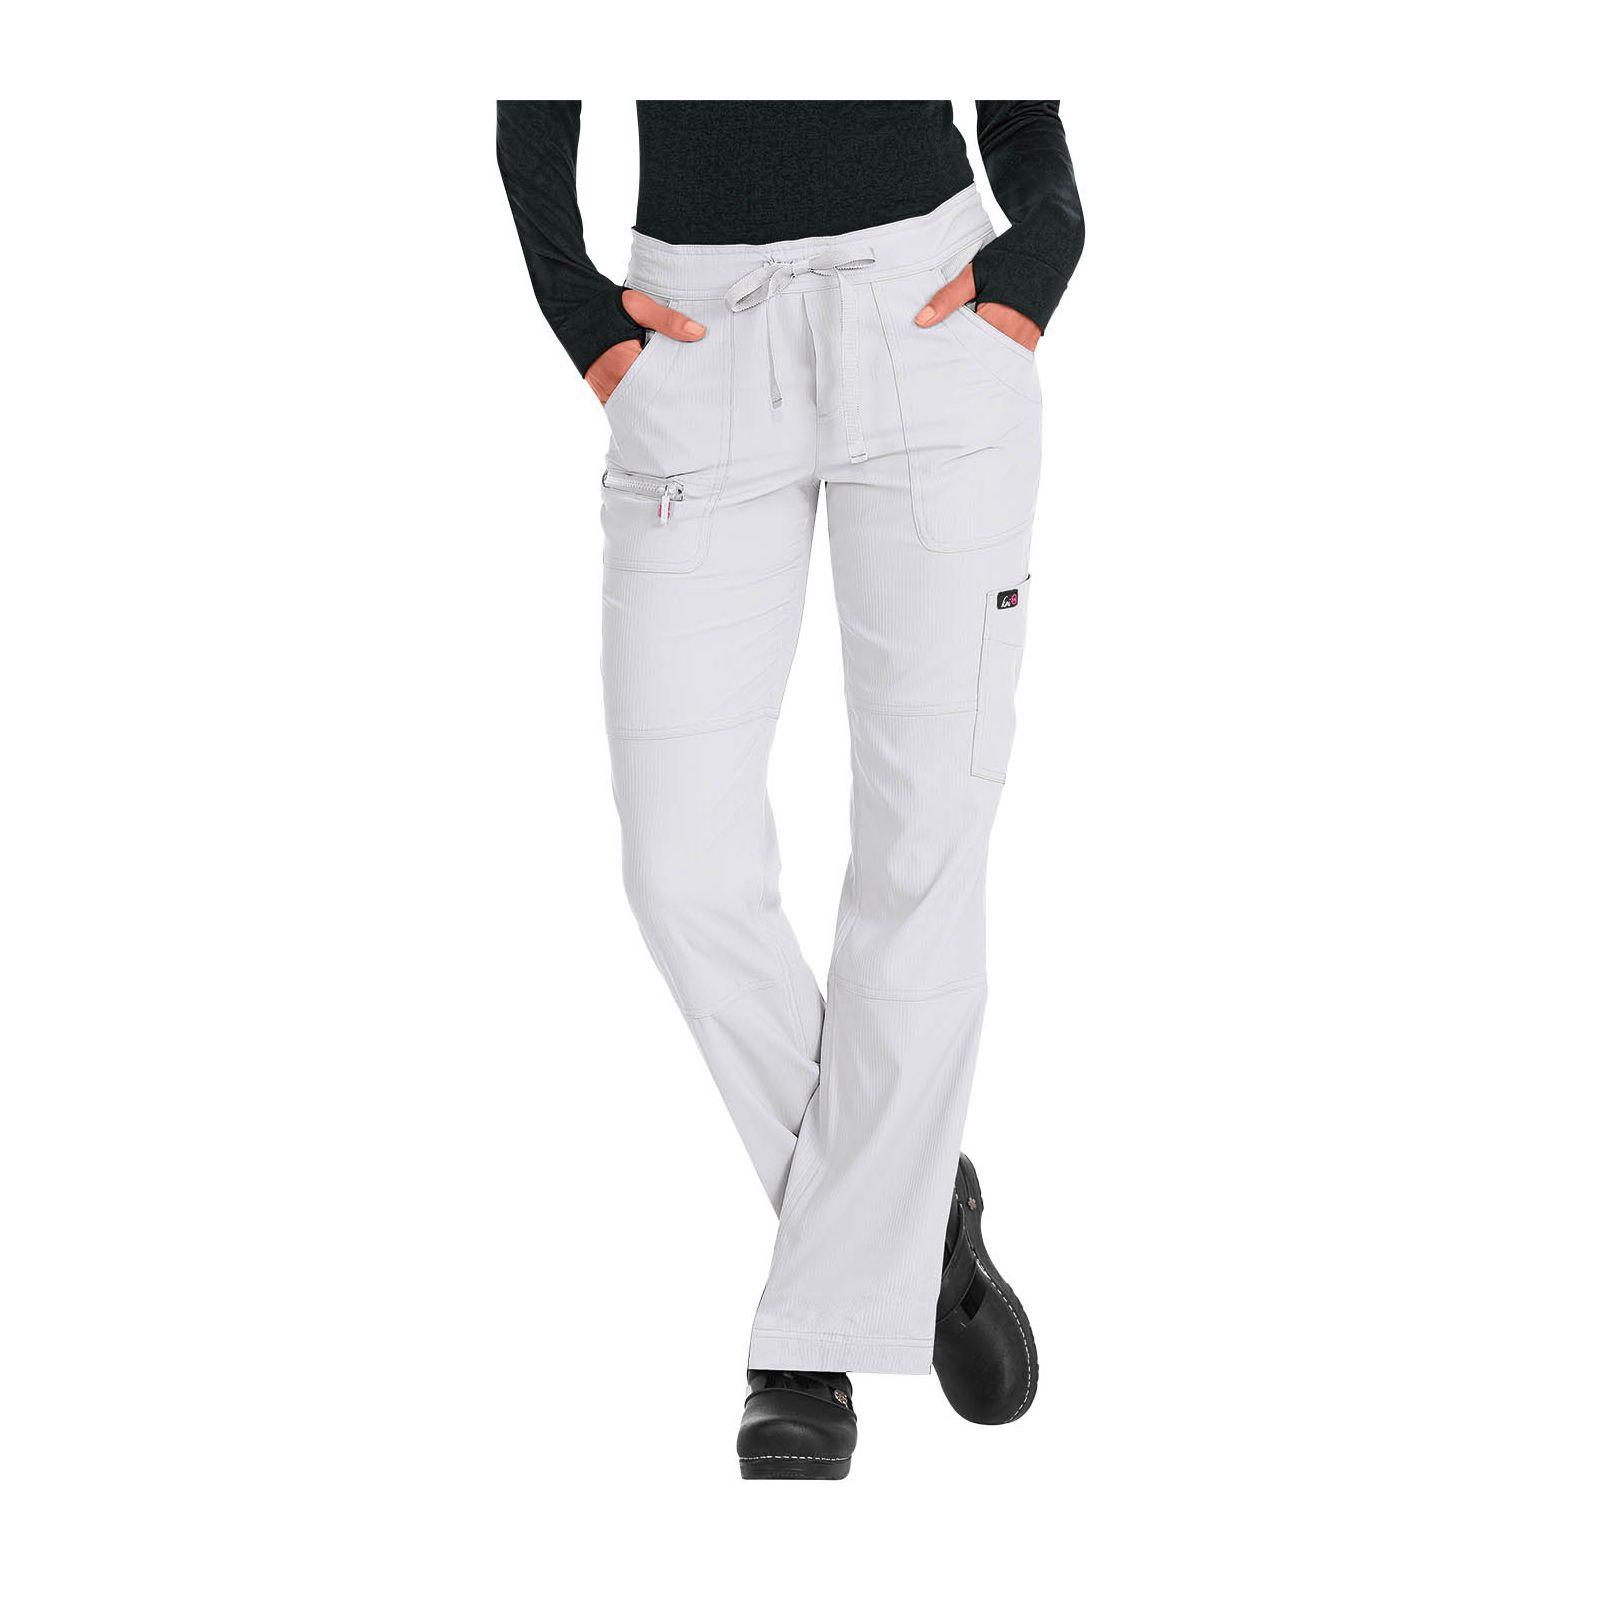 "Pantalon médical Femme Koi ""Peace"", collection ""Koi Lite"" (721-) blanc face"